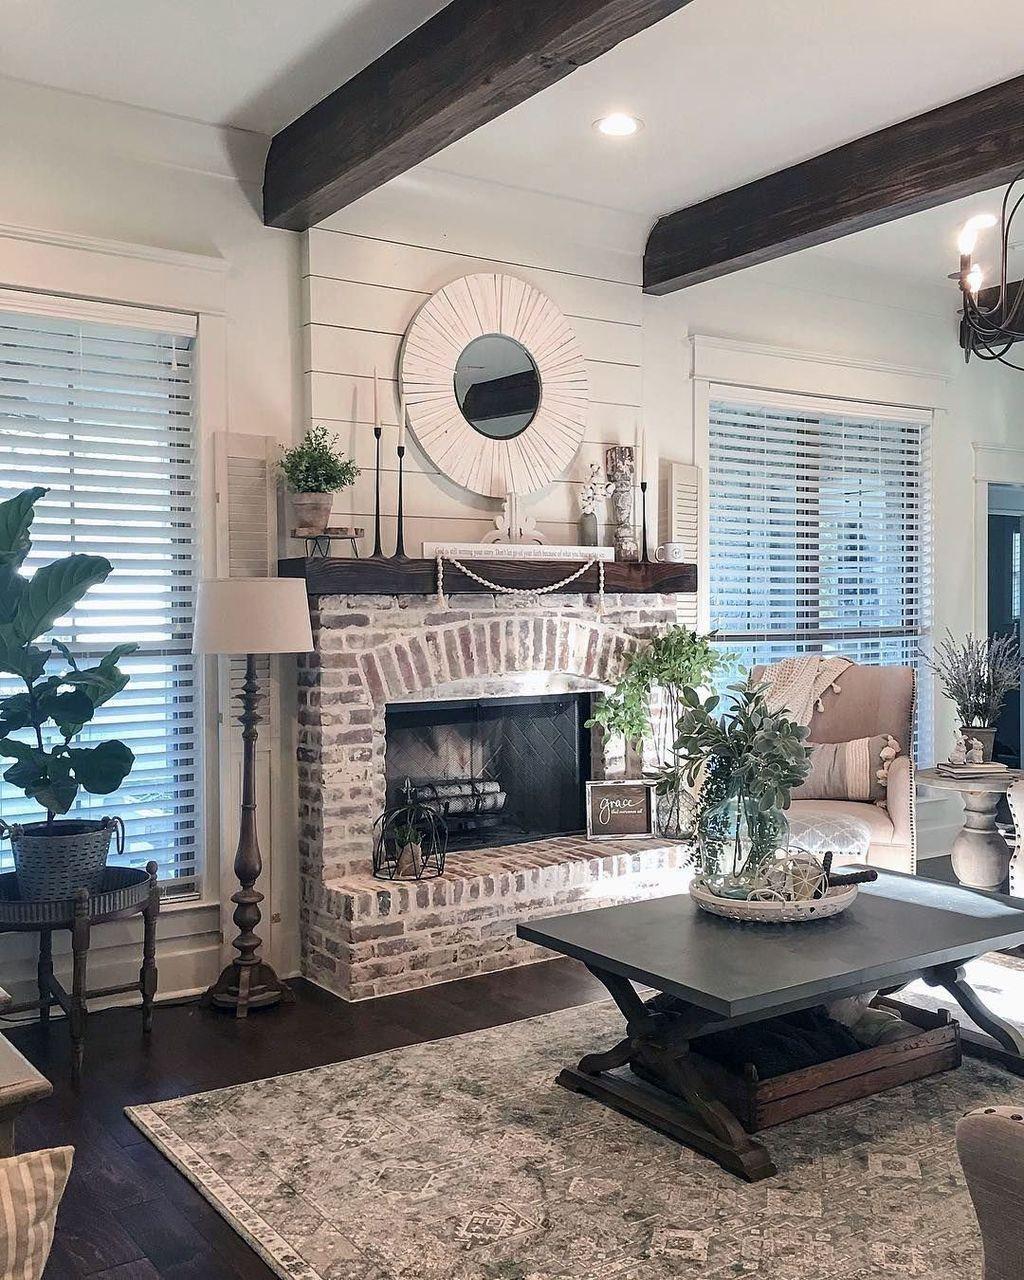 30 Gorgeous Country Farmhouse Decor Ideas For Living Room Farm House Living Room Home Fireplace Home Living Room